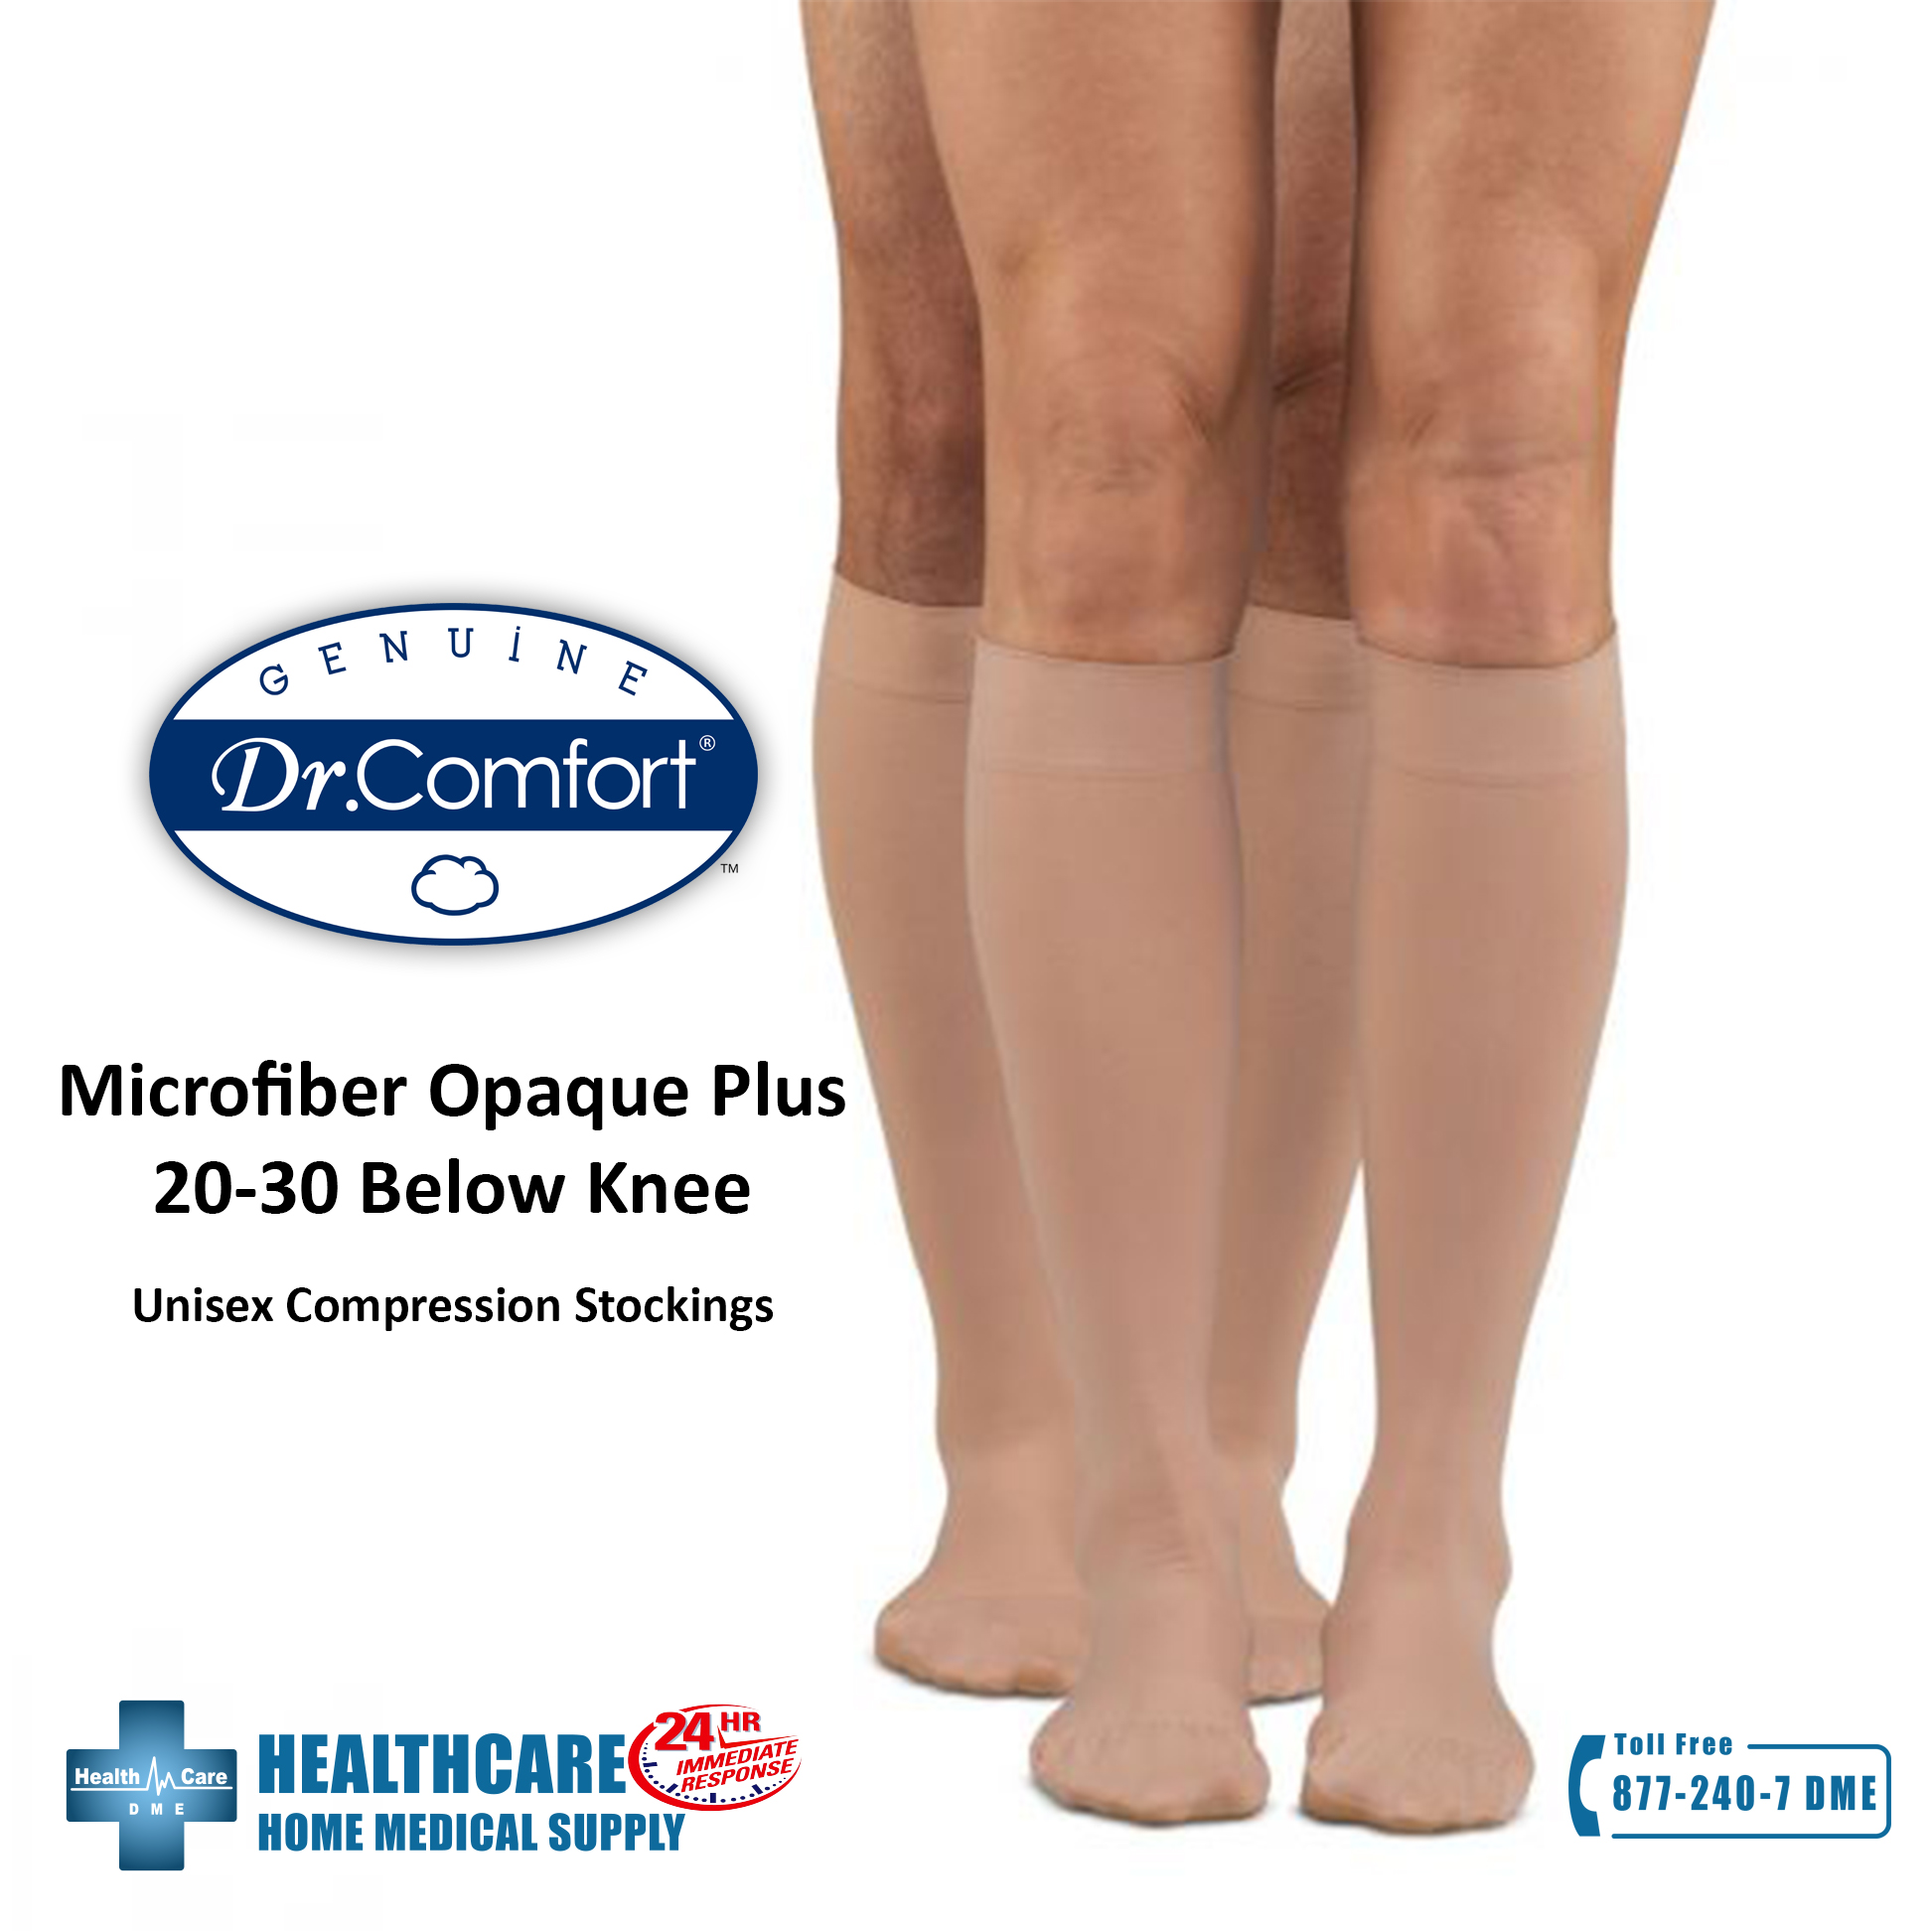 Dr. Comfort Microfiber Opaque Plus 20-30 Below Knee | Michigan USA Unisex Compression Stockings